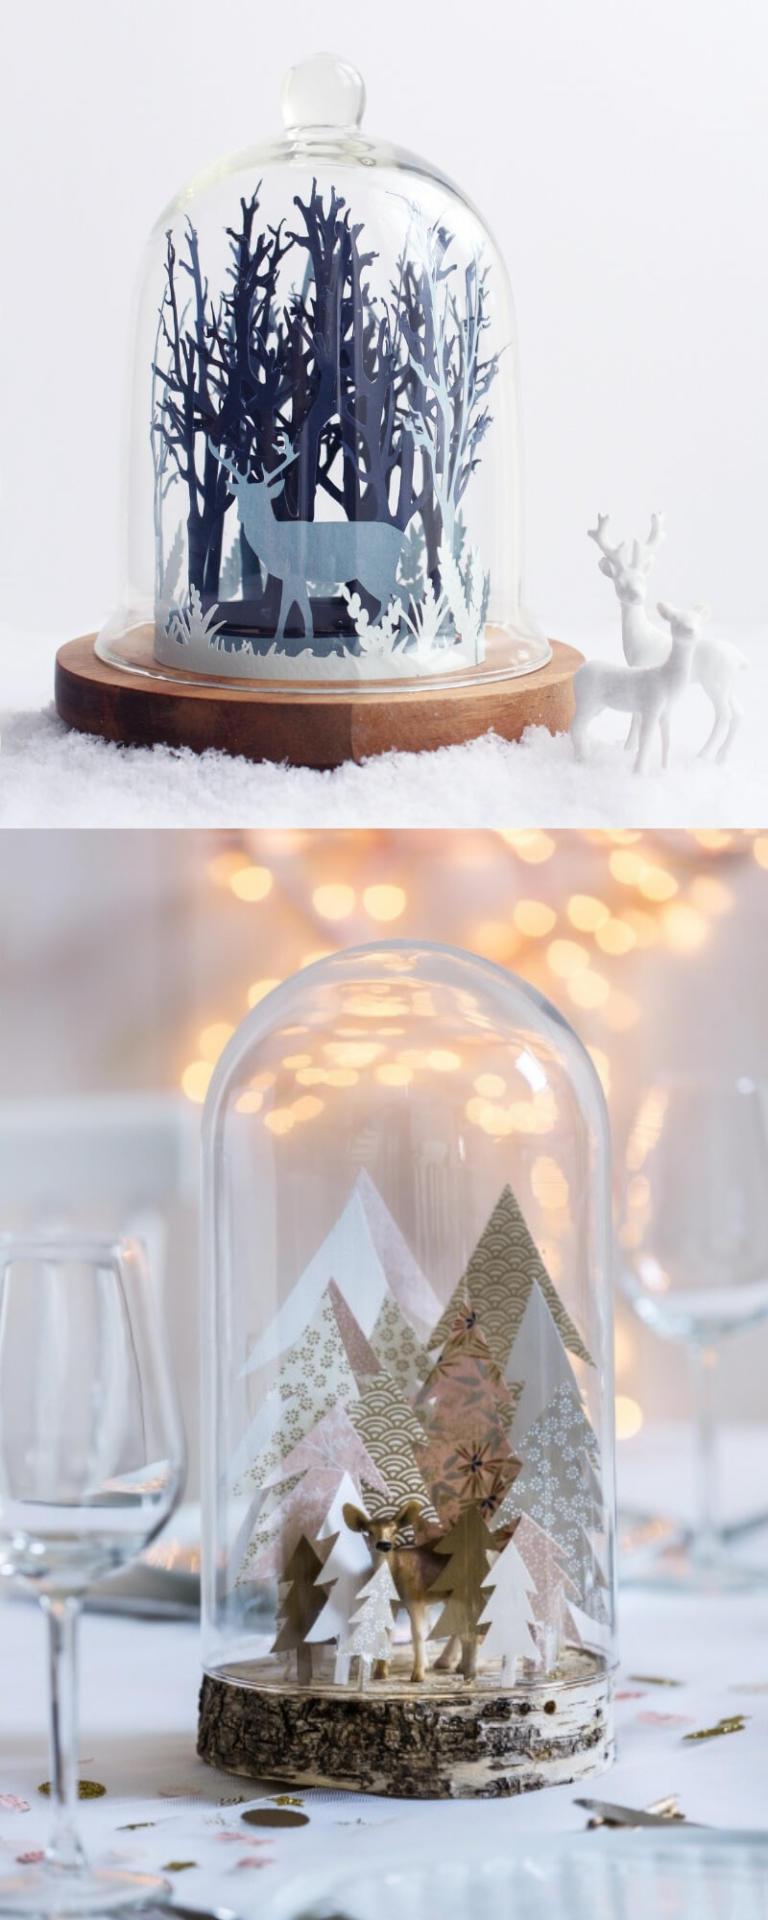 capsulas-cristal-decoracion